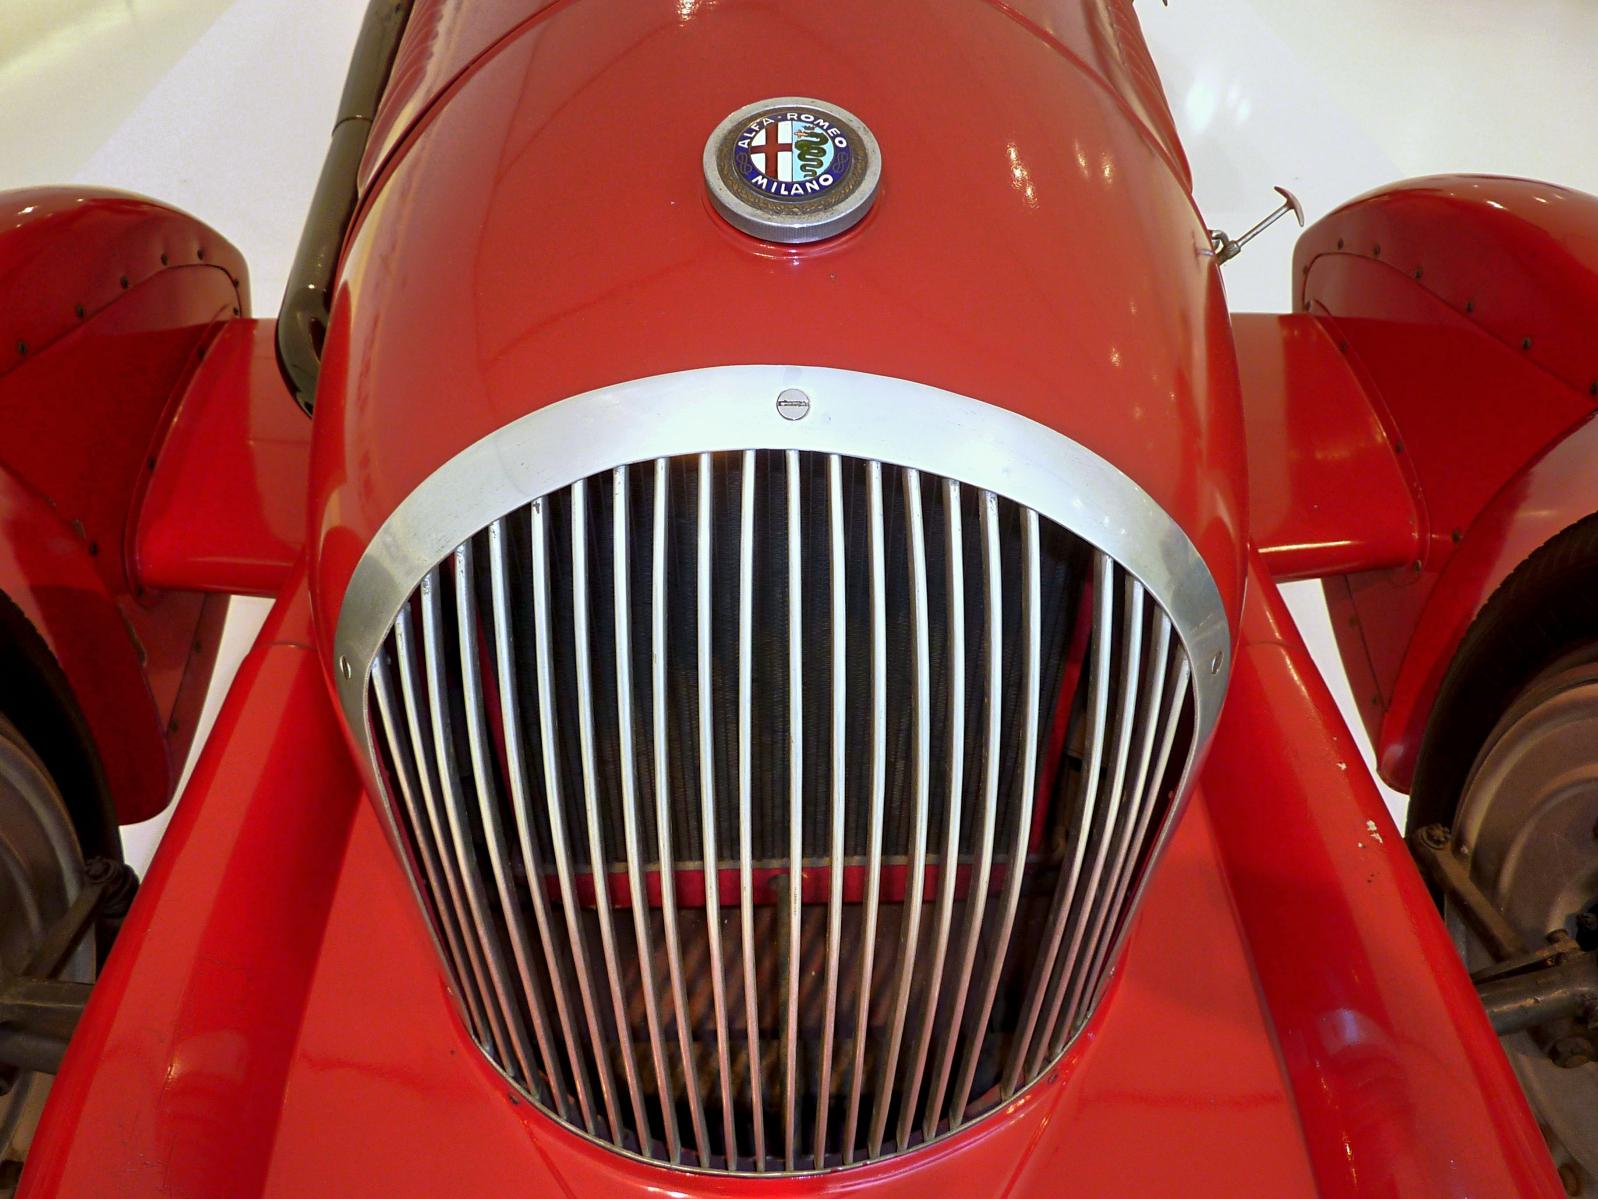 1934 Alfa Romeo Gran Premio Tipo B P3 Aerodinamica (7).jpg